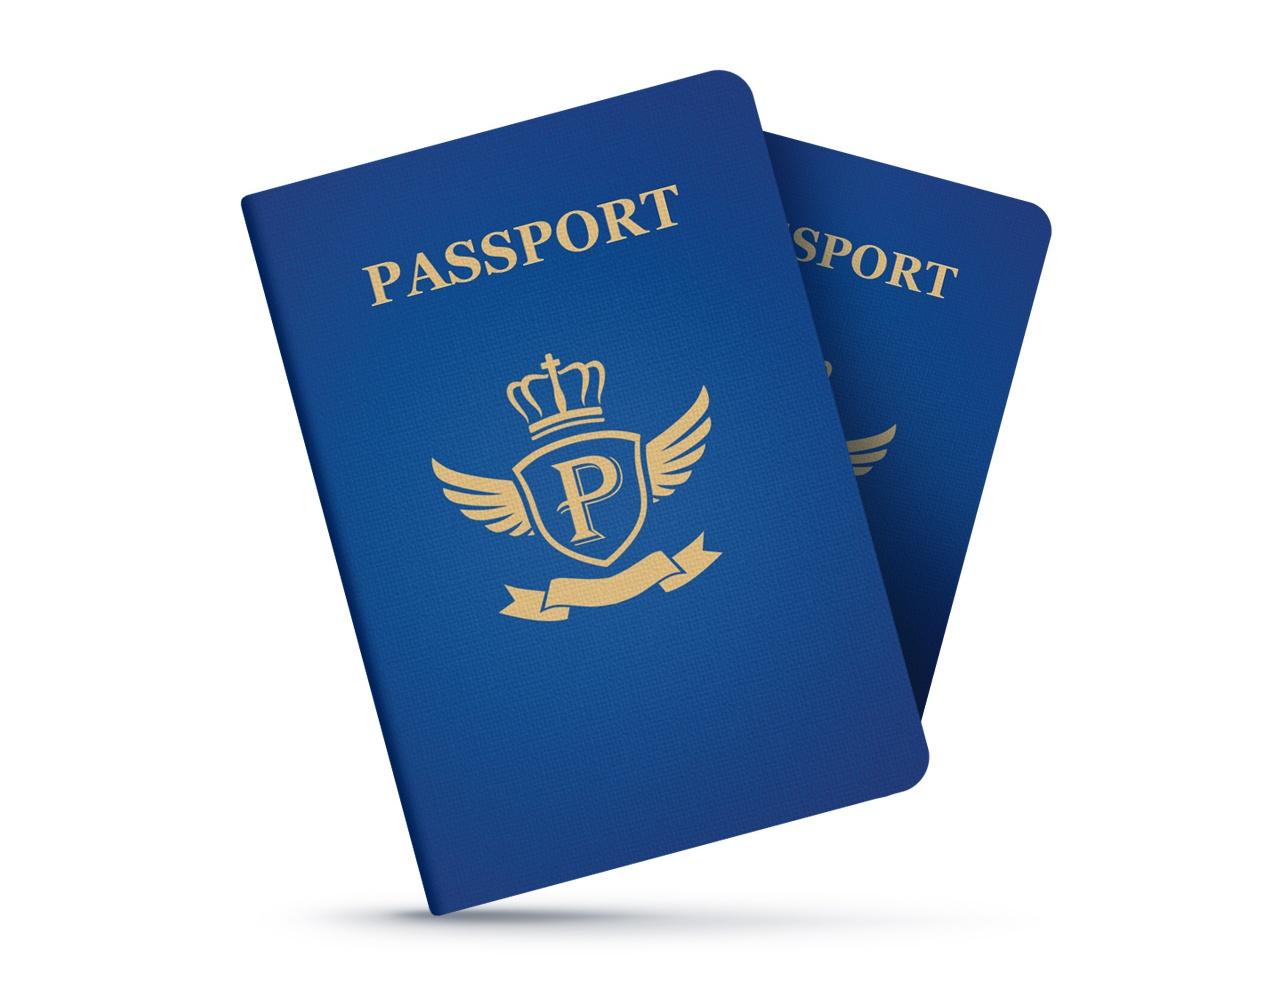 United states passport clipart picture black and white library Us passport clipart - ClipartFest picture black and white library